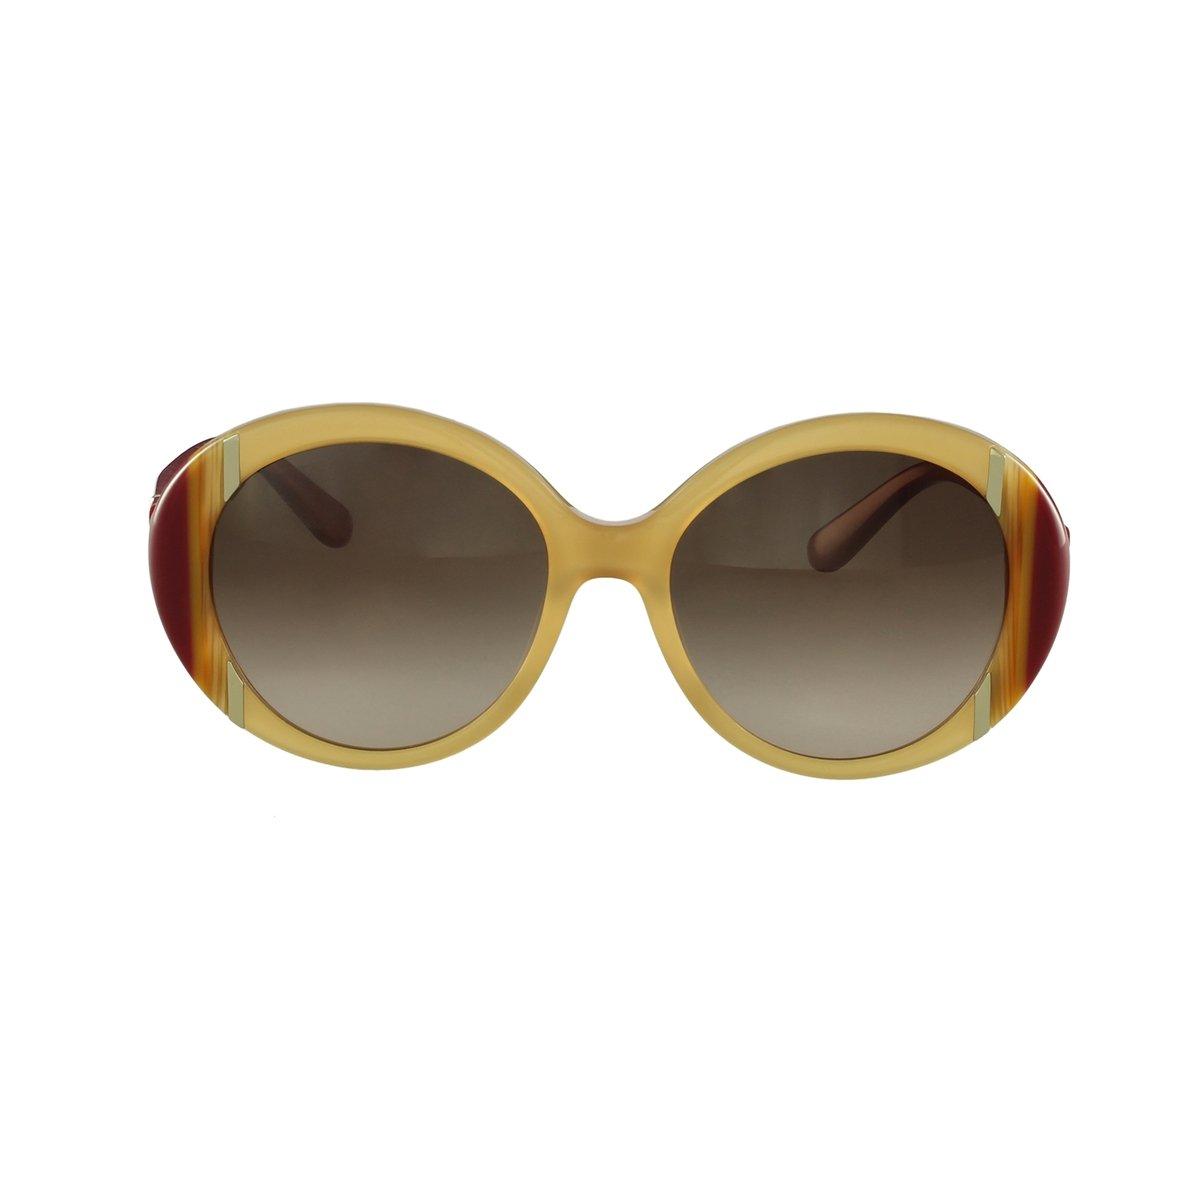 Óculos de Sol Salvatore Ferragamo Fashion Marrom - Compre Agora   Netshoes e6b0261739